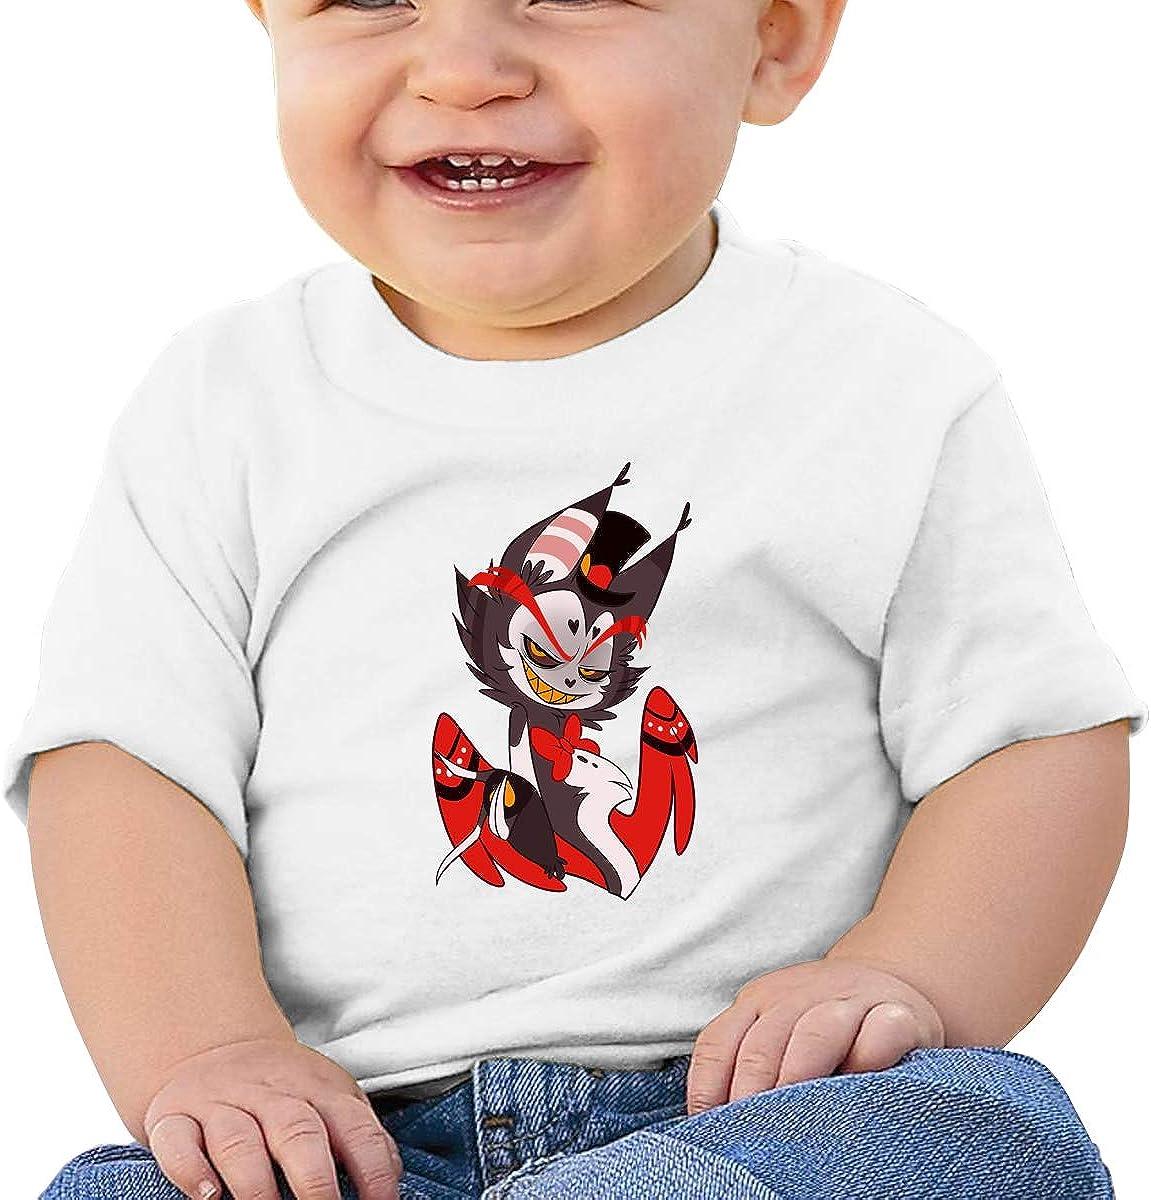 Kangtians Baby Hazbin Hotel Husk Shirt Toddler Cotton Tee